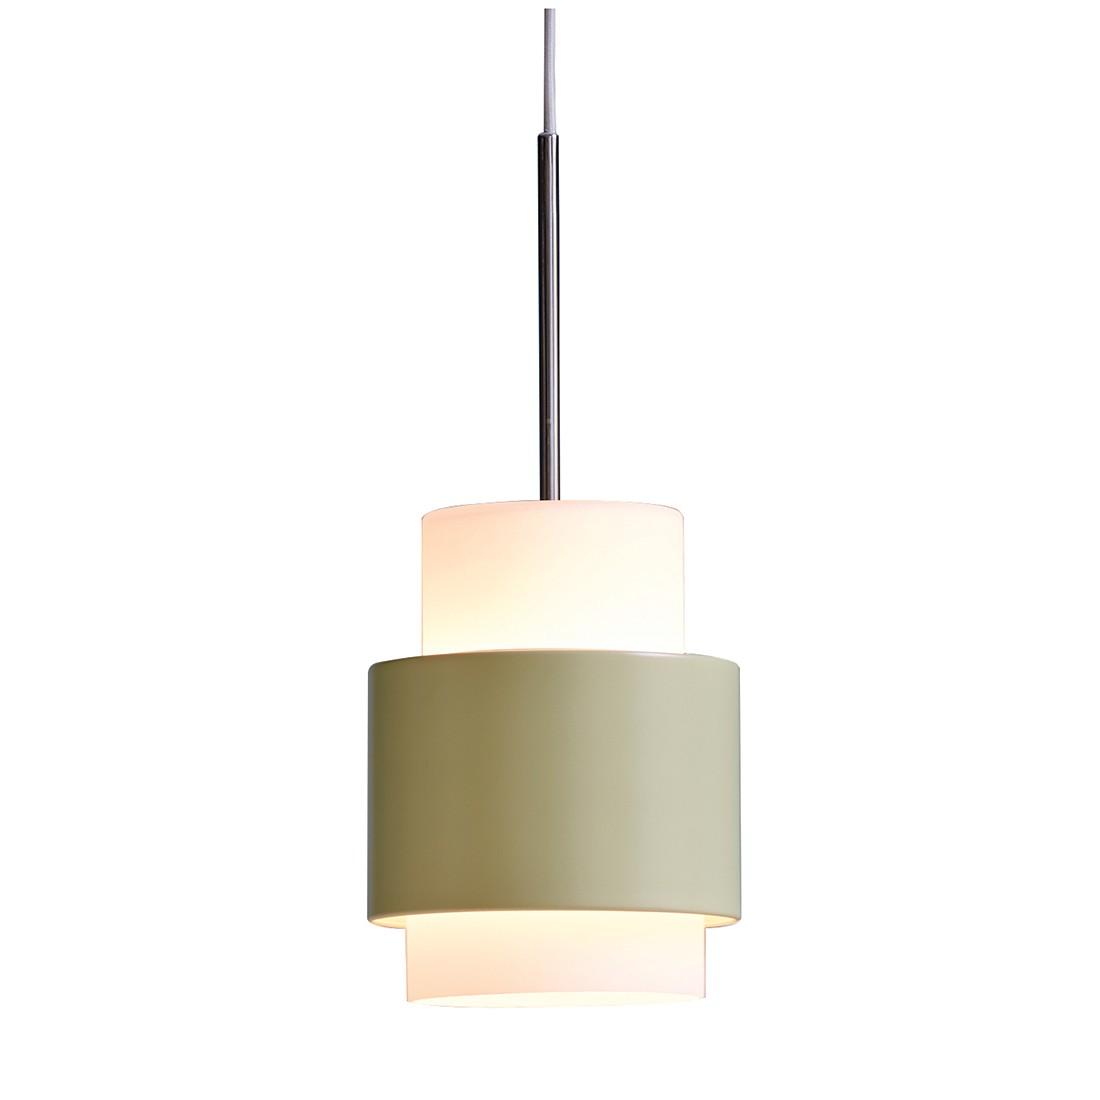 pendelleuchte y1949 metall glas gelb 1 flammig herstal a online bestellen. Black Bedroom Furniture Sets. Home Design Ideas